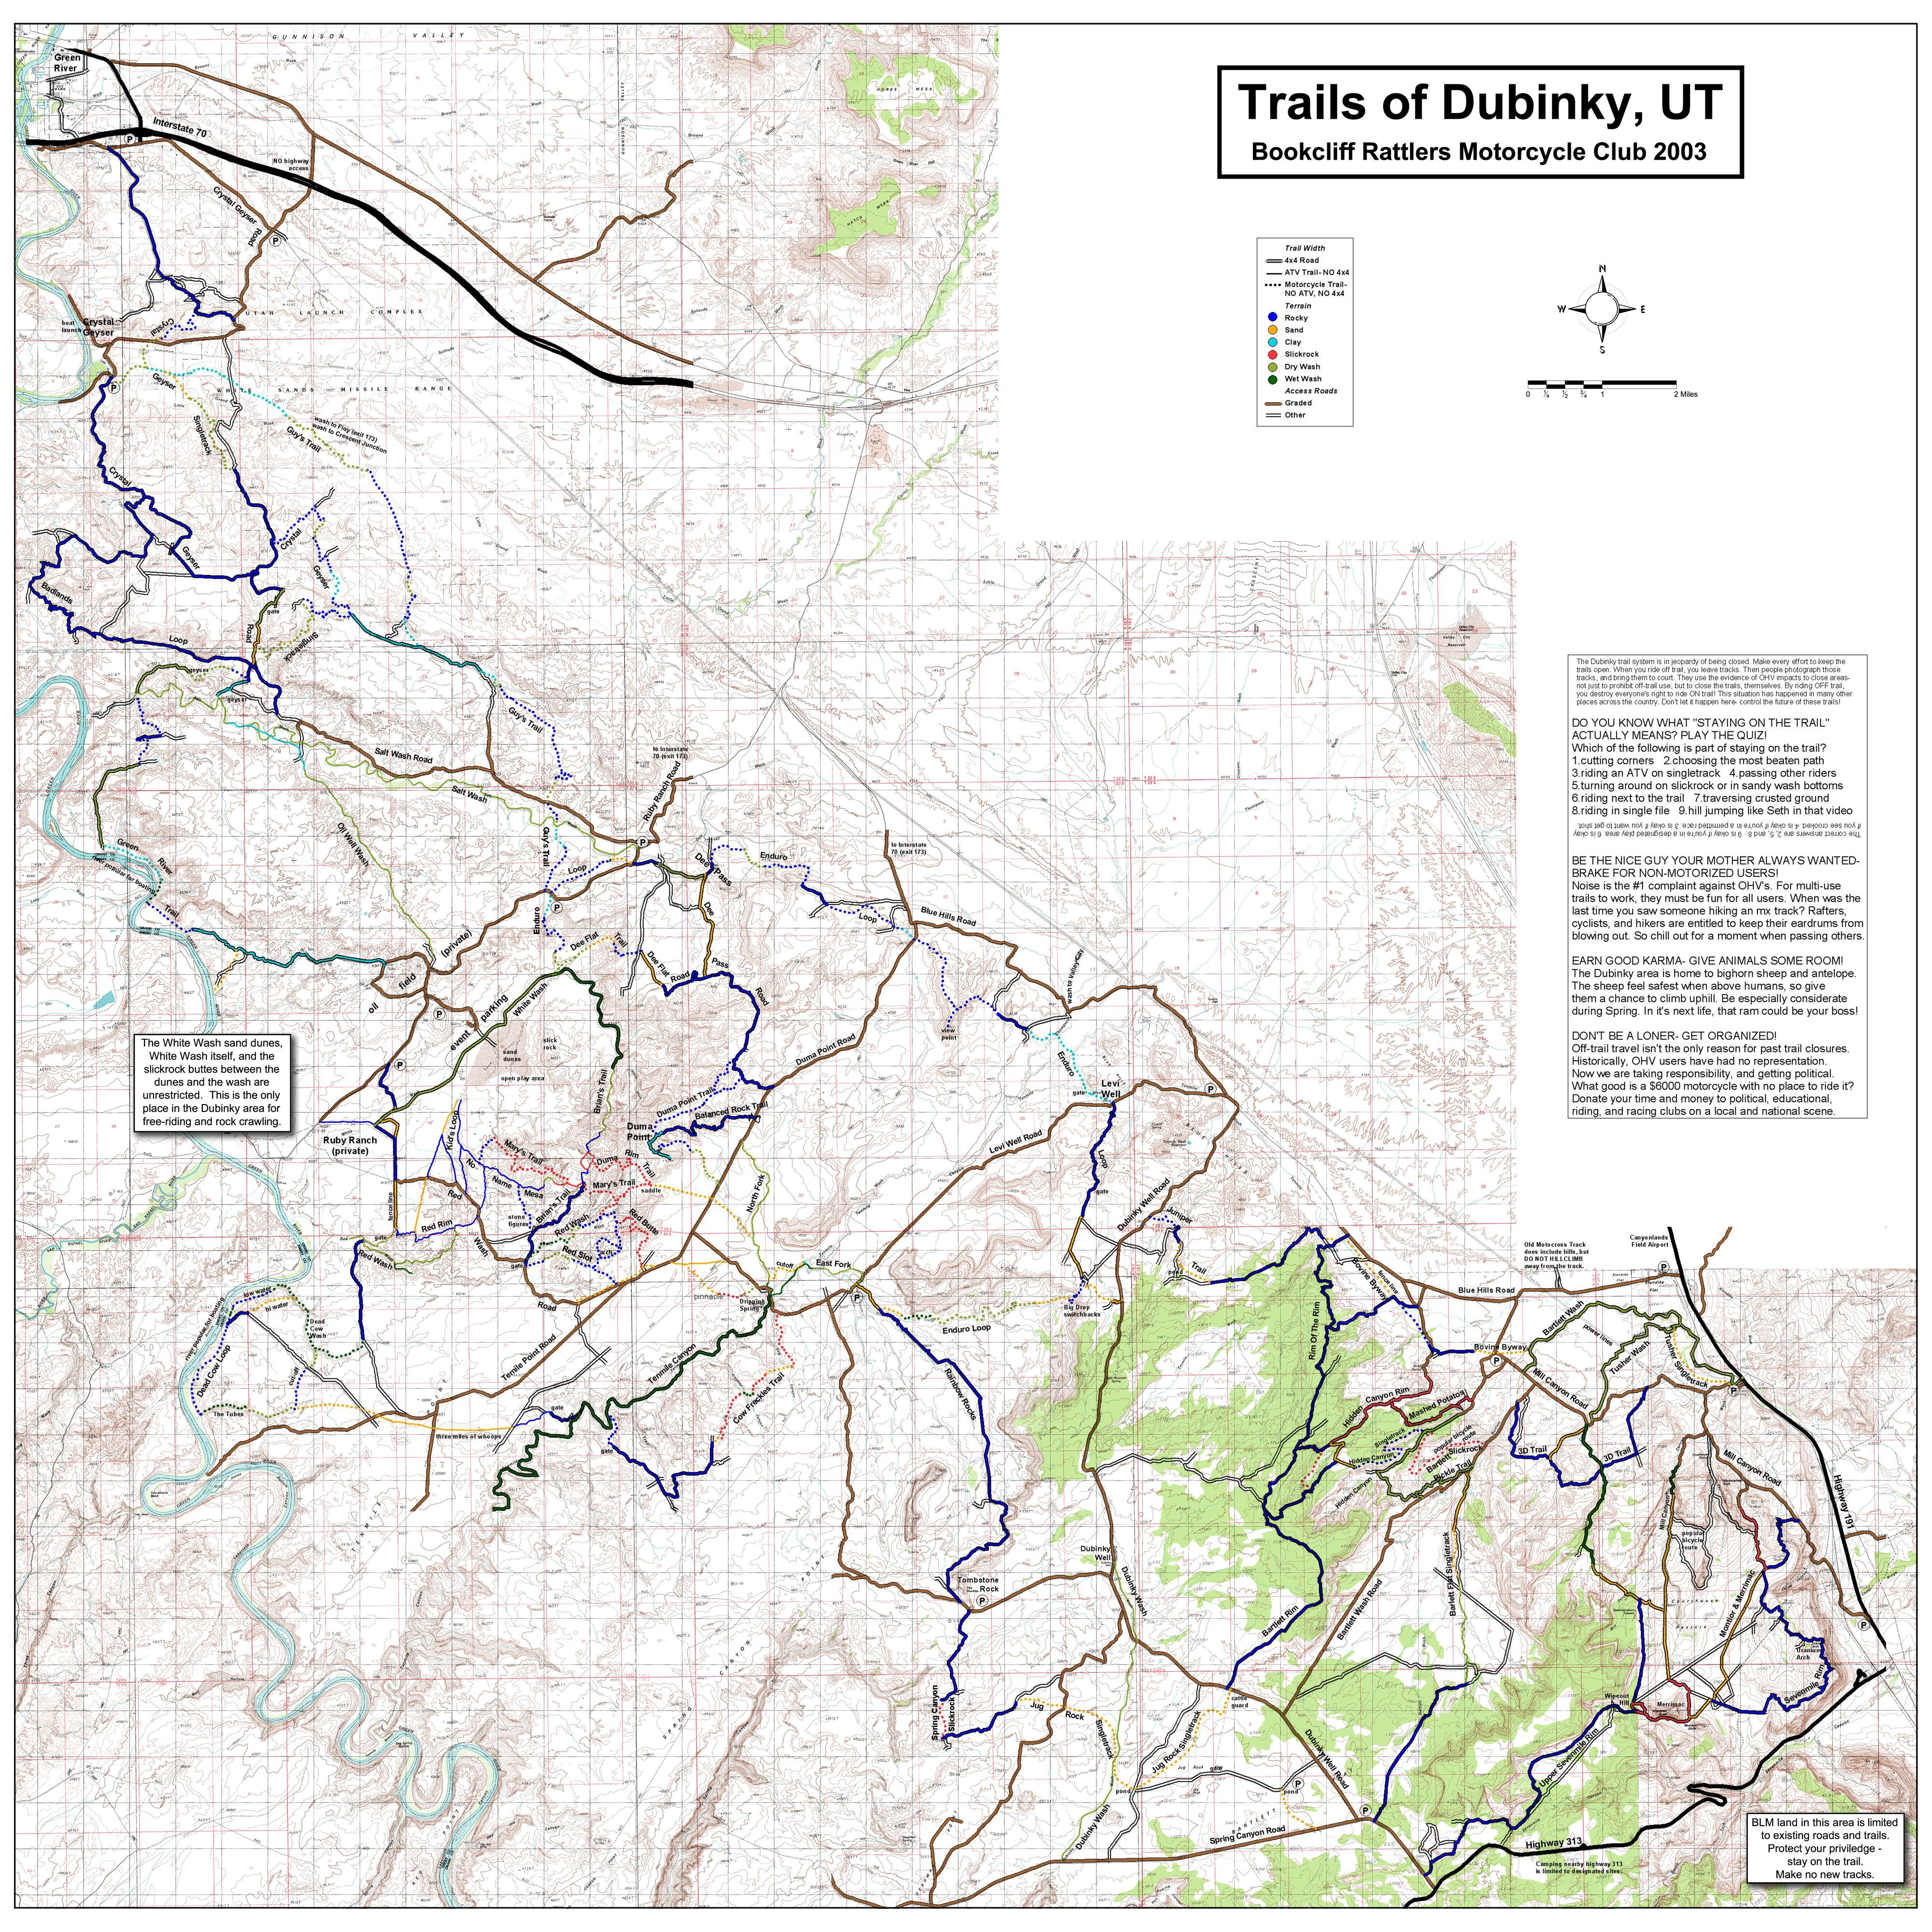 Utah Moto Trails Dirt Bike And ATV Trails Brians Trail To Dead - Wash map